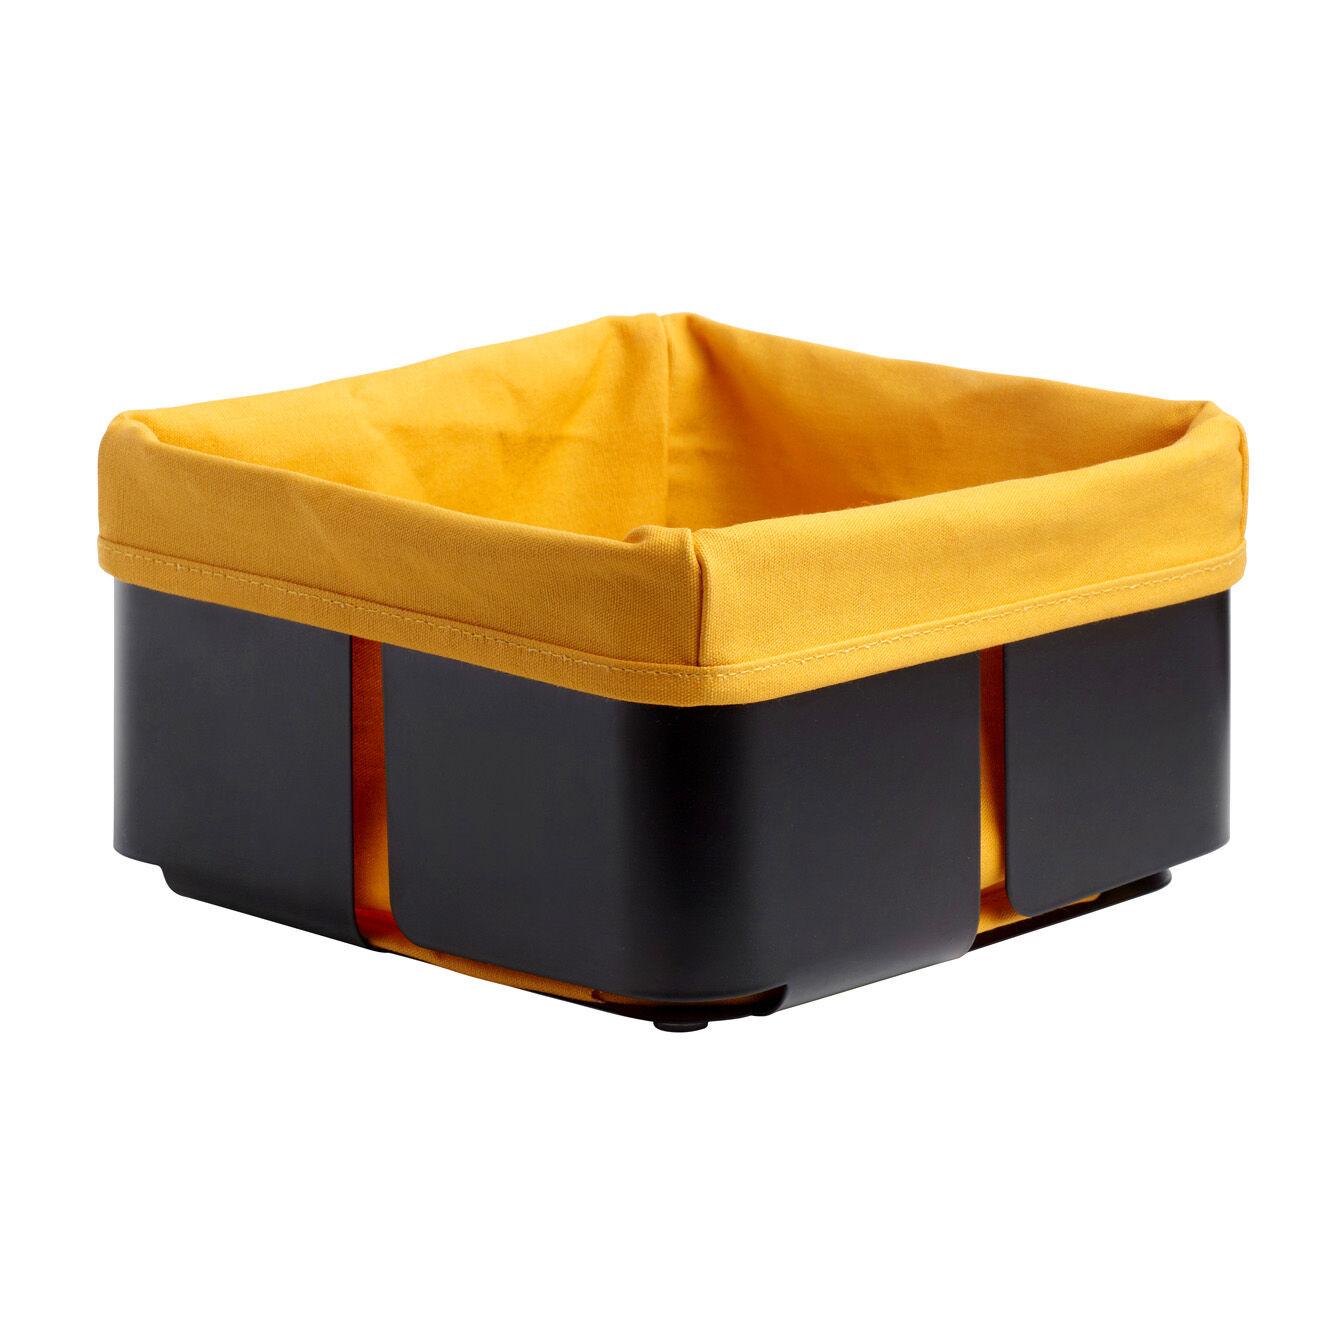 Steel Function Corbeille à pain métal & tissu noir/orange - 20x20x11 cm